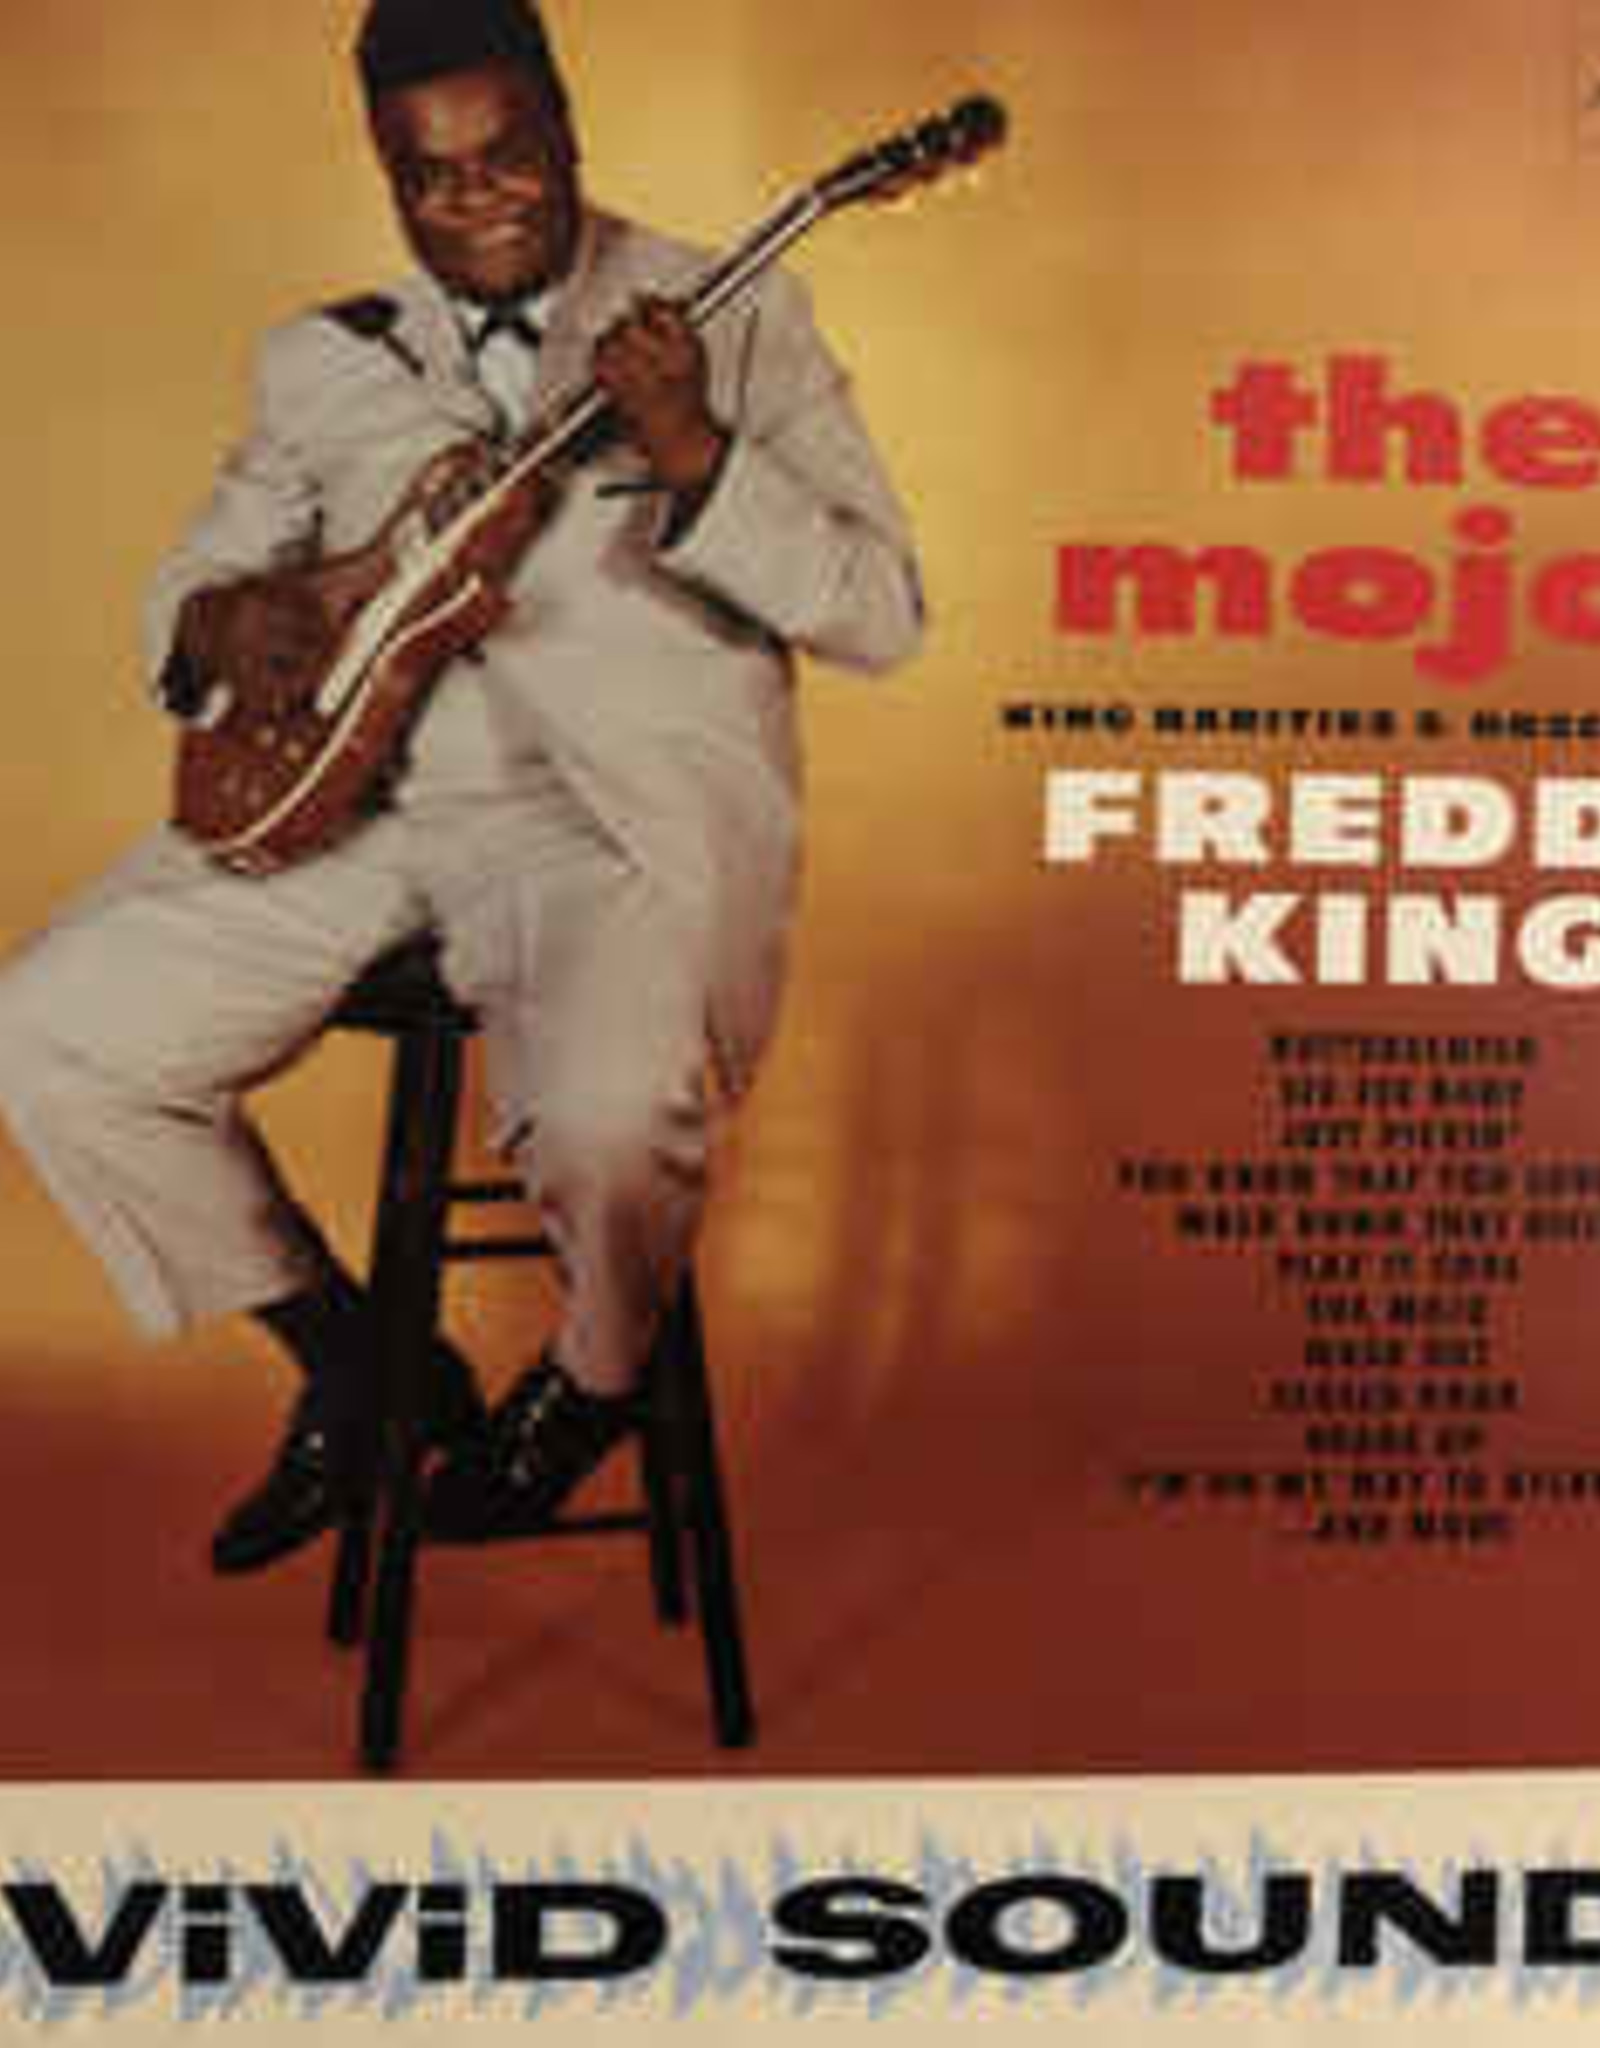 Freddy King - Mojo! King Rarities & Obscurities (Gold Vinyl) (Rsd 2019)